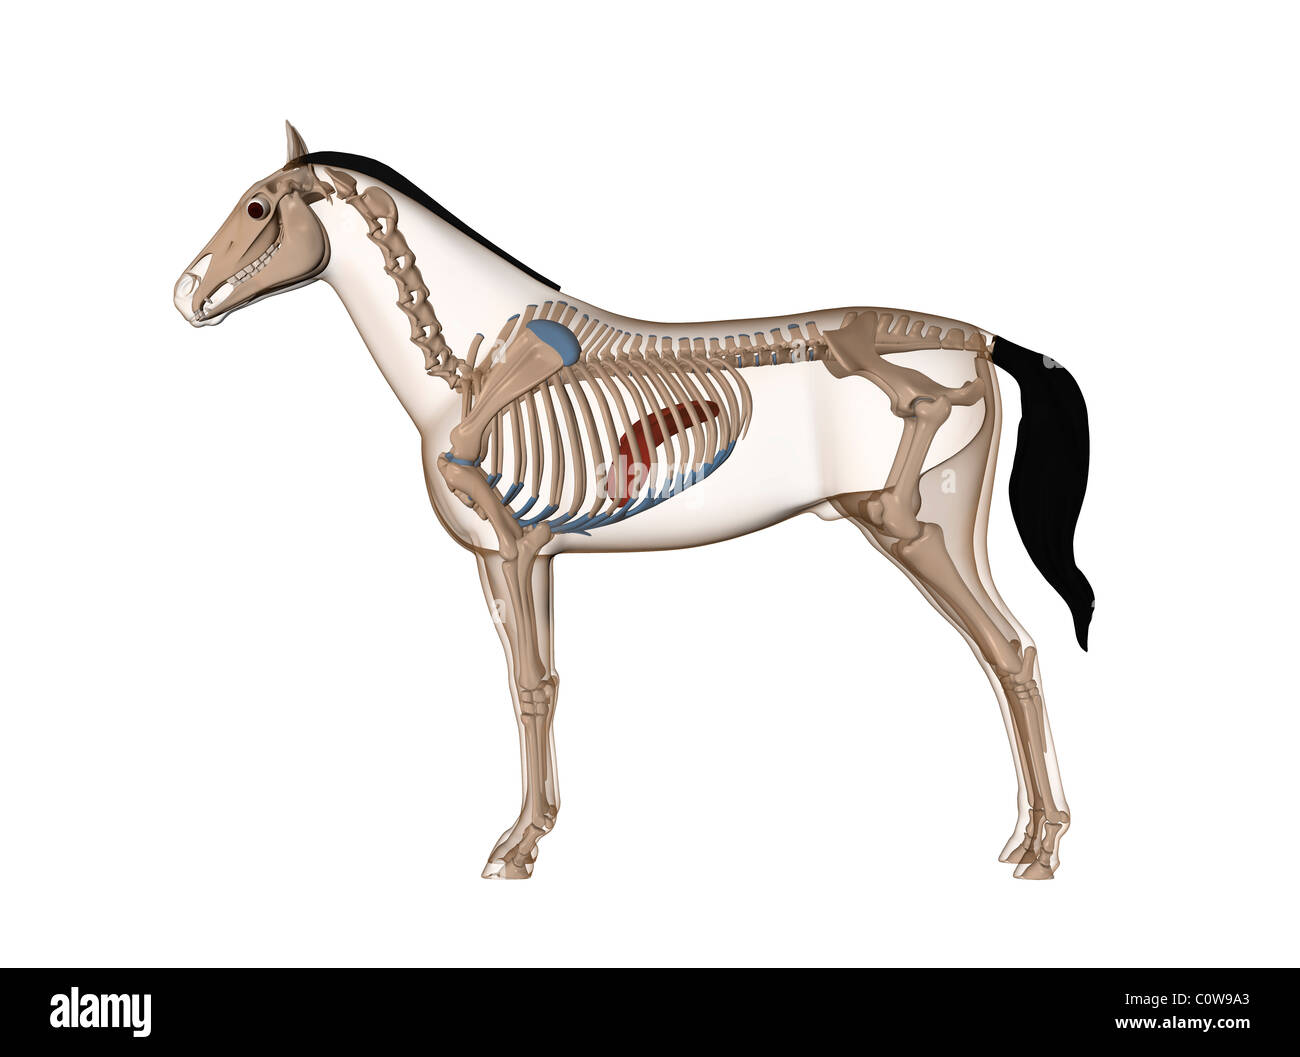 Horse Anatomy Liver Stock Photo 34976875 Alamy